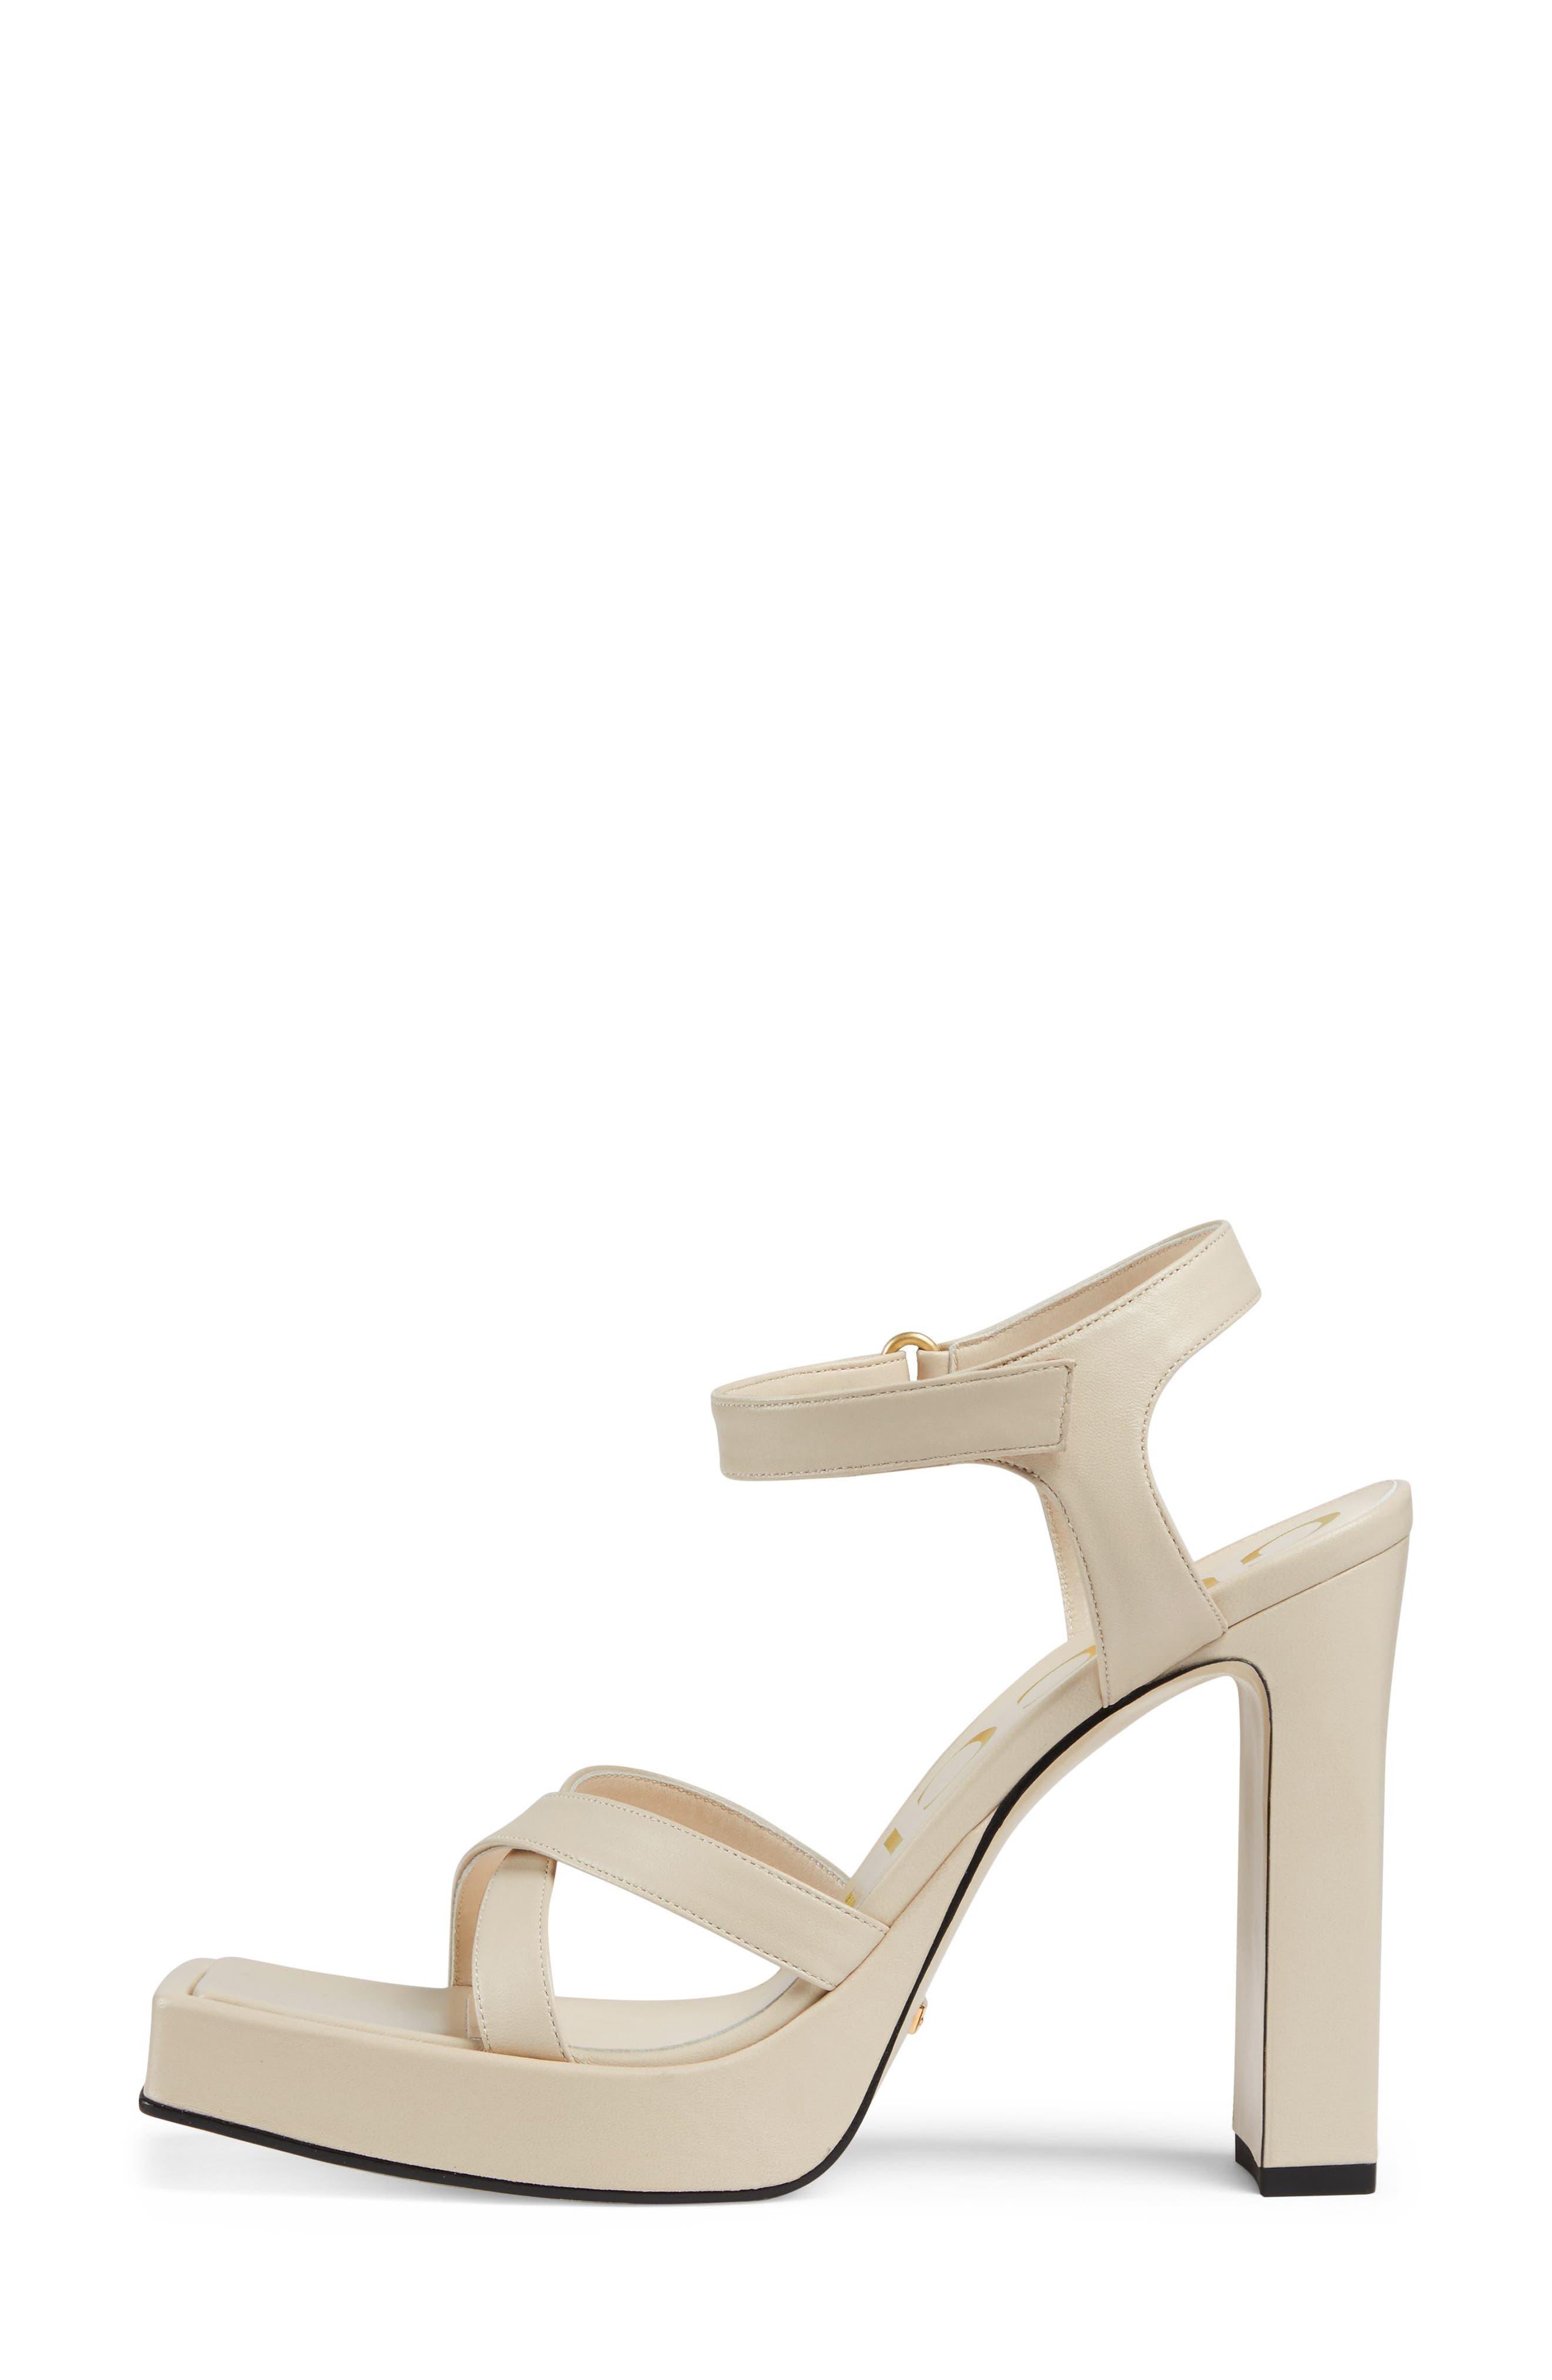 Costanze Platform Sandal,                             Alternate thumbnail 2, color,                             White